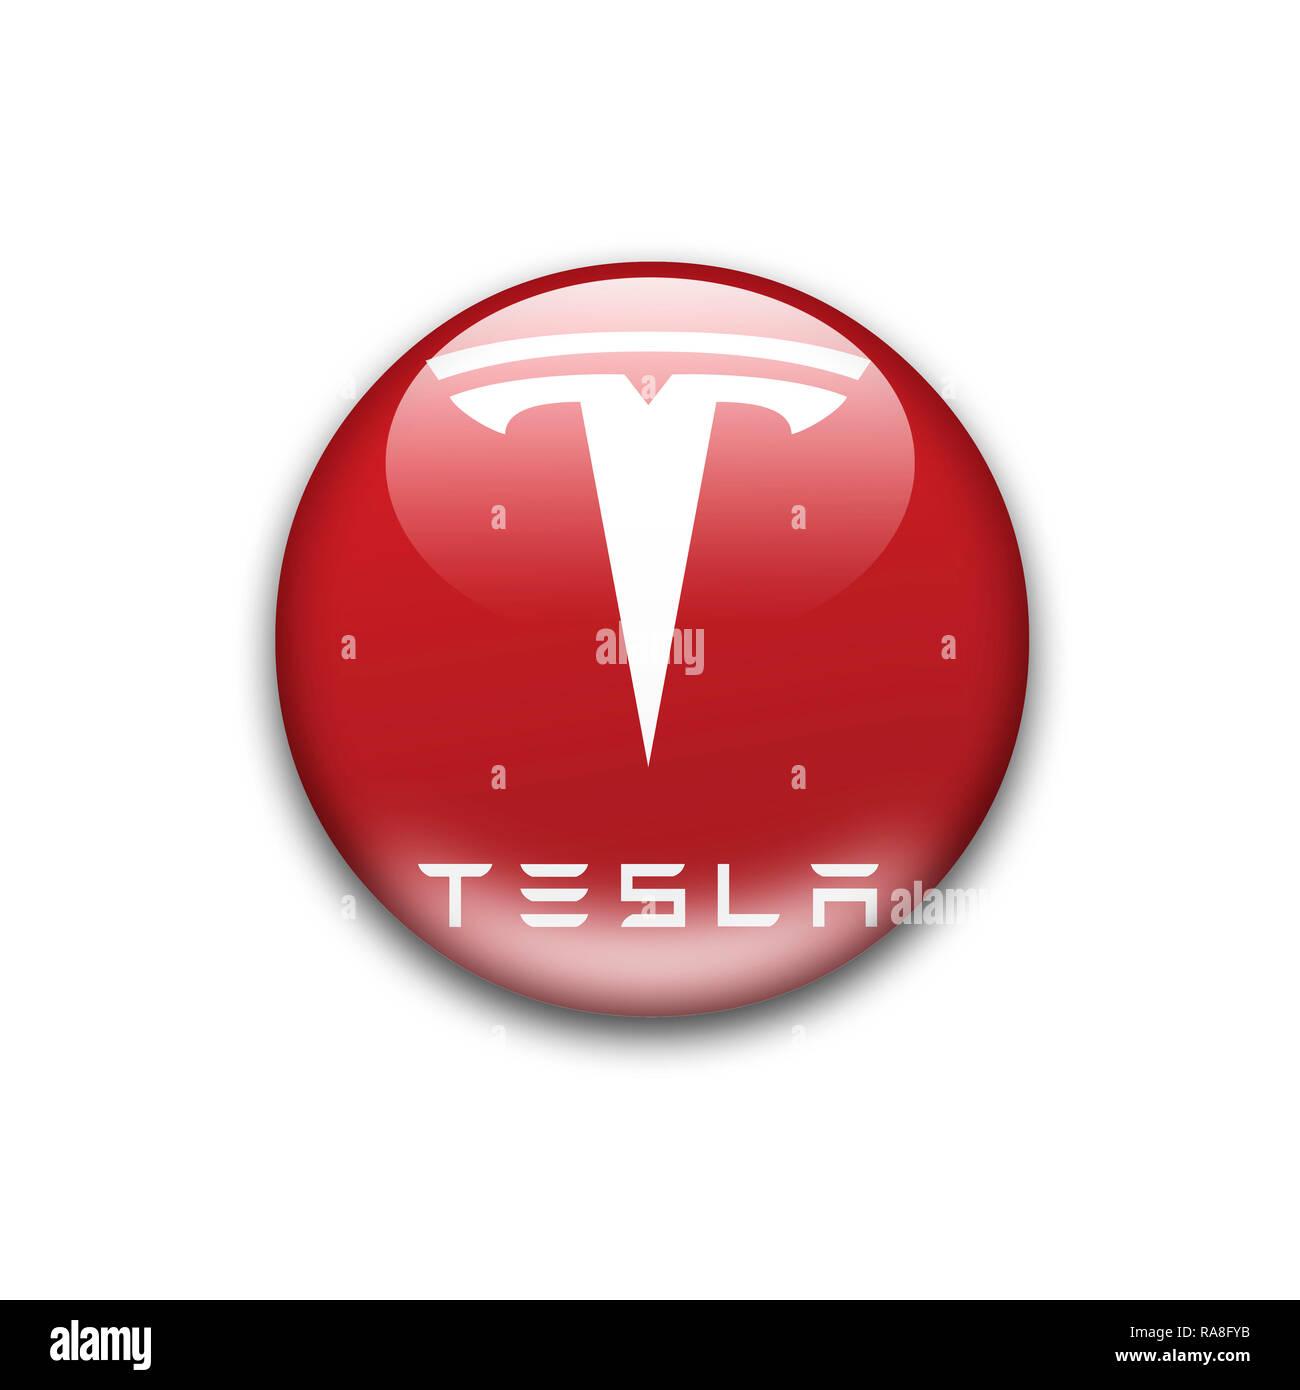 Tesla Logo Stock Photos & Tesla Logo Stock Images - Alamy